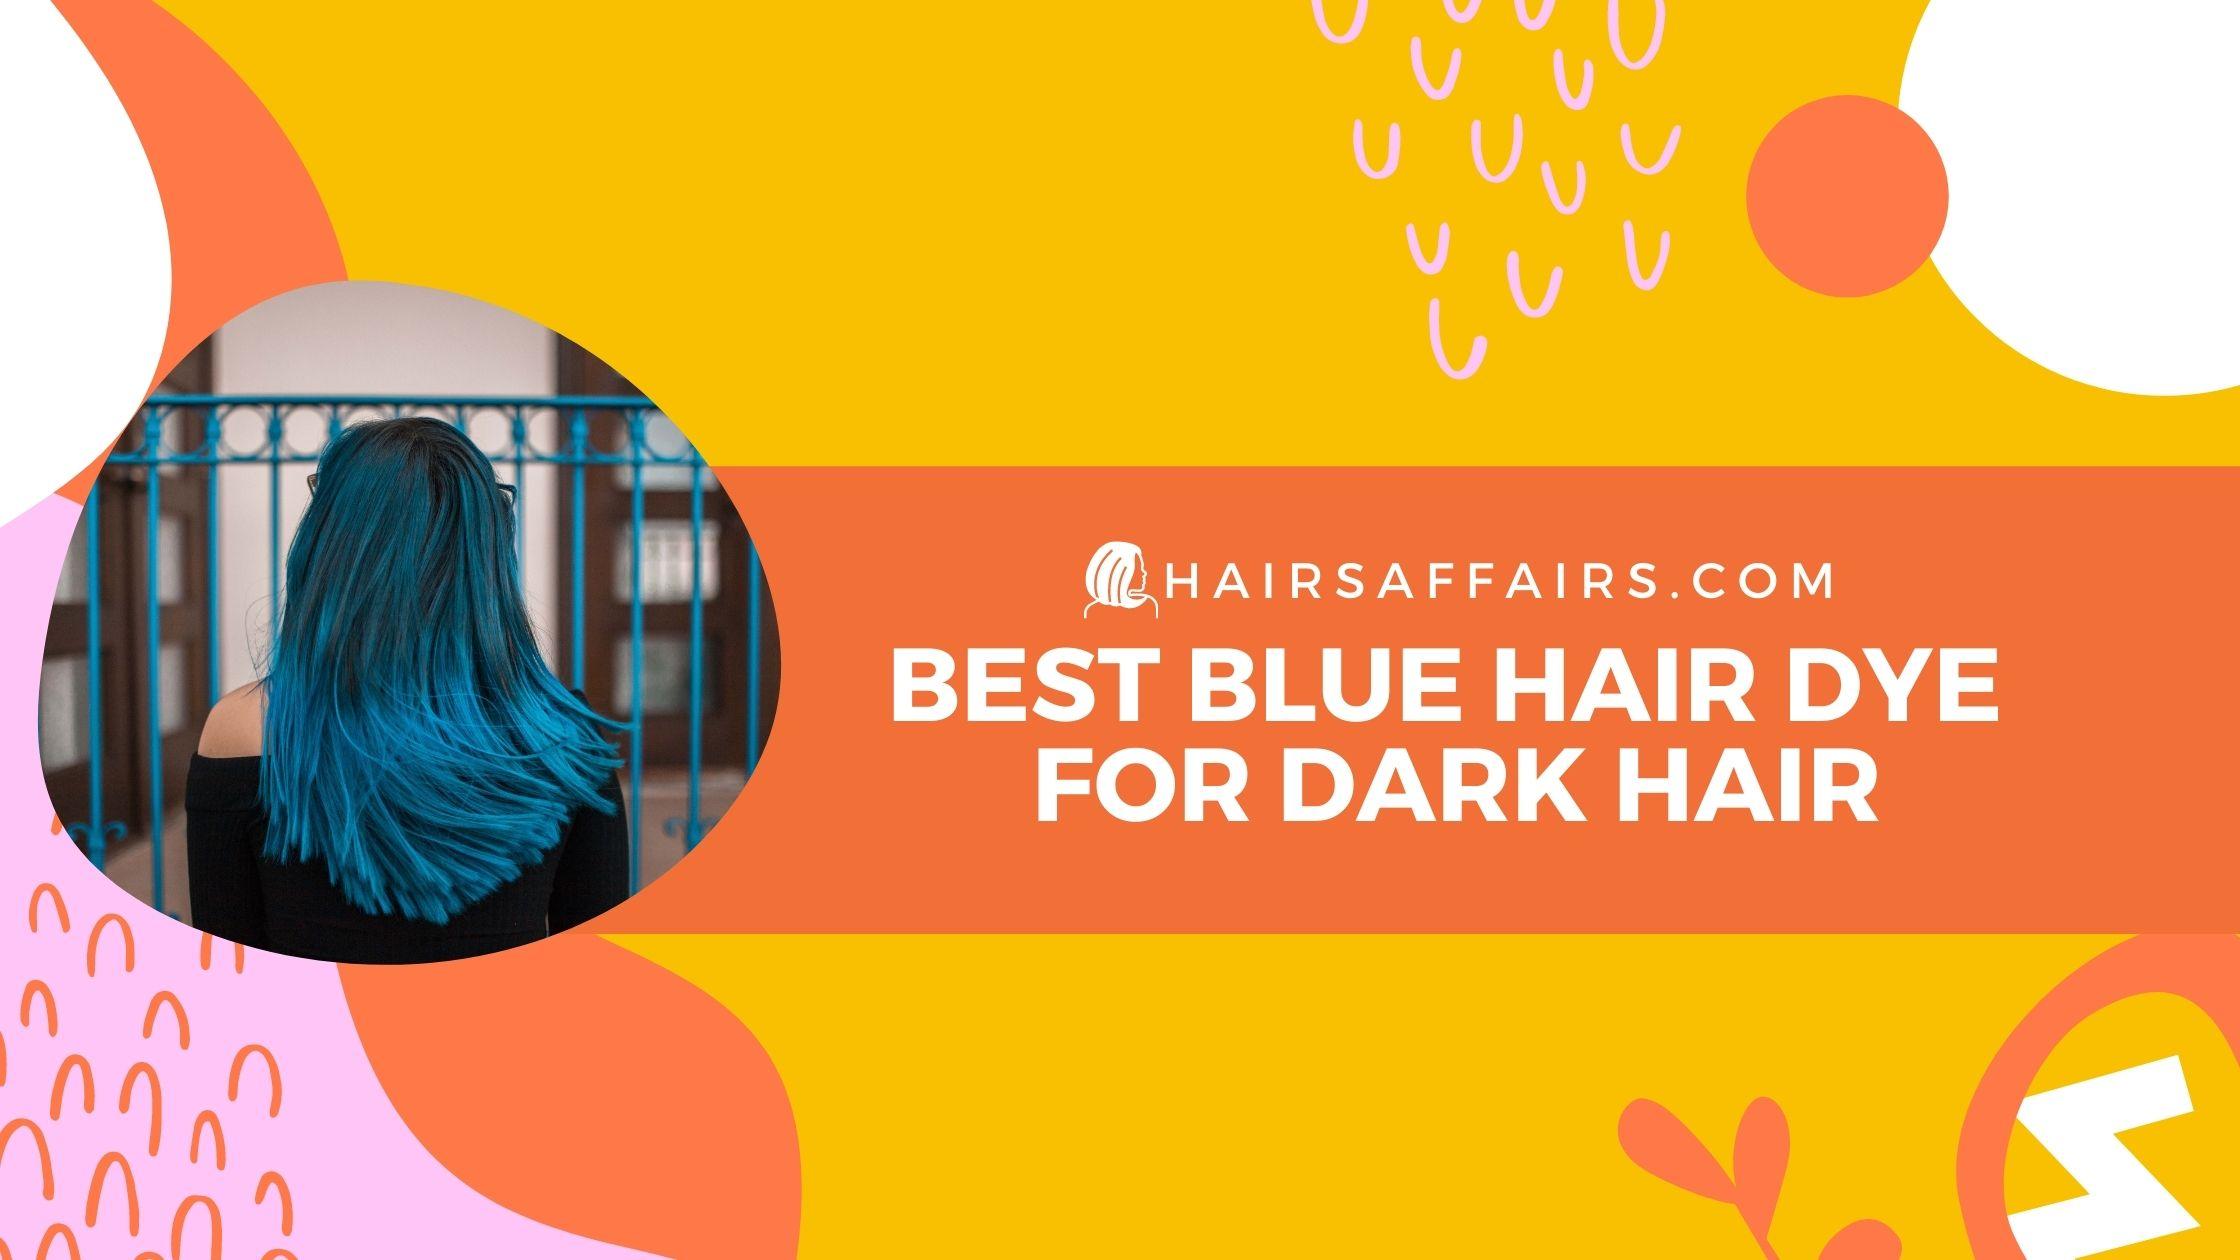 best blue hair dye for dark hair